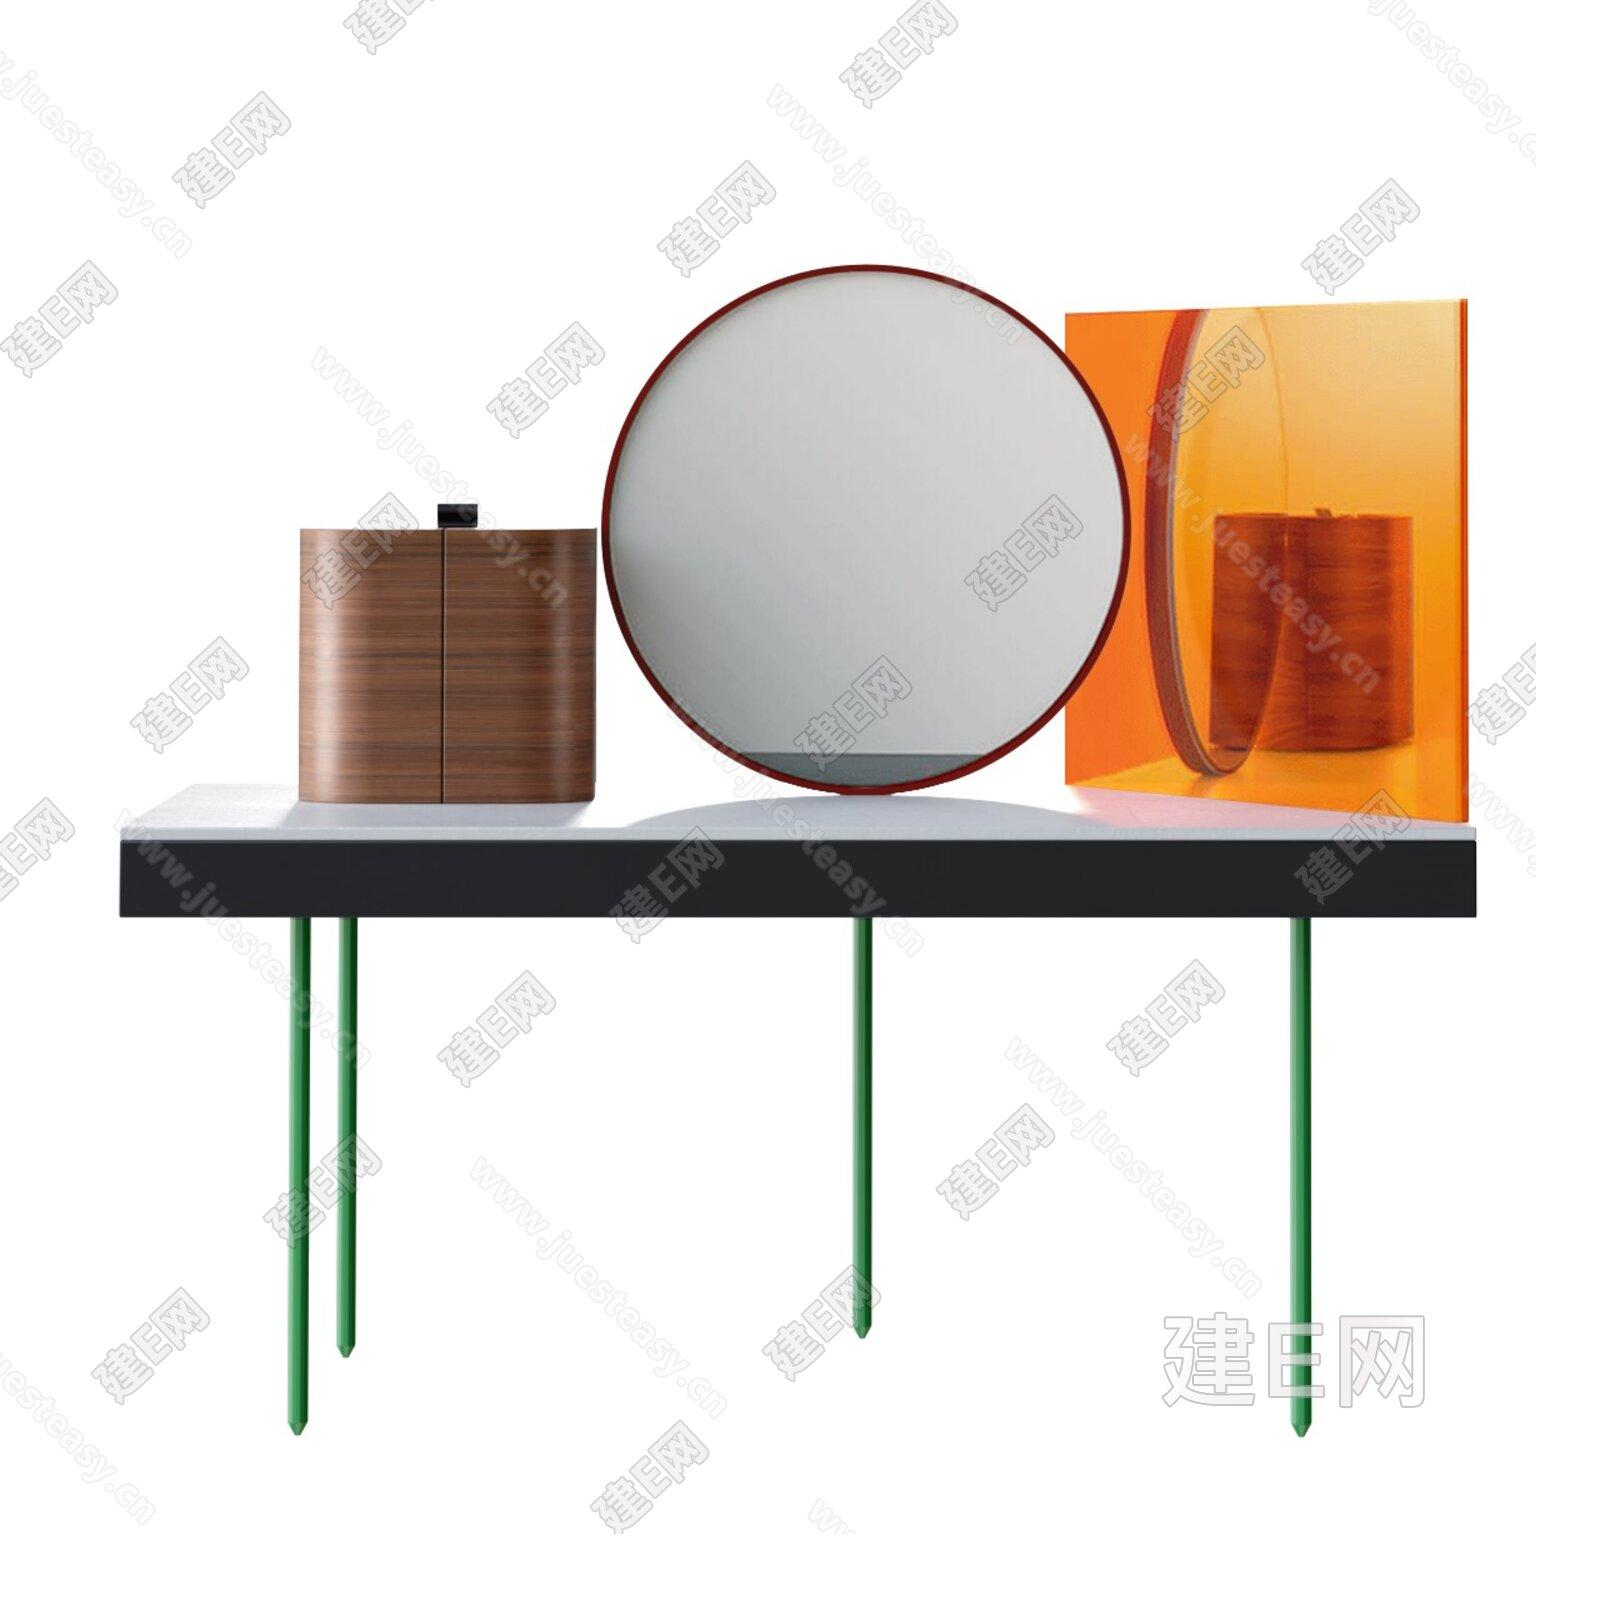 b.d barcelona design 现代梳妆台3d模型